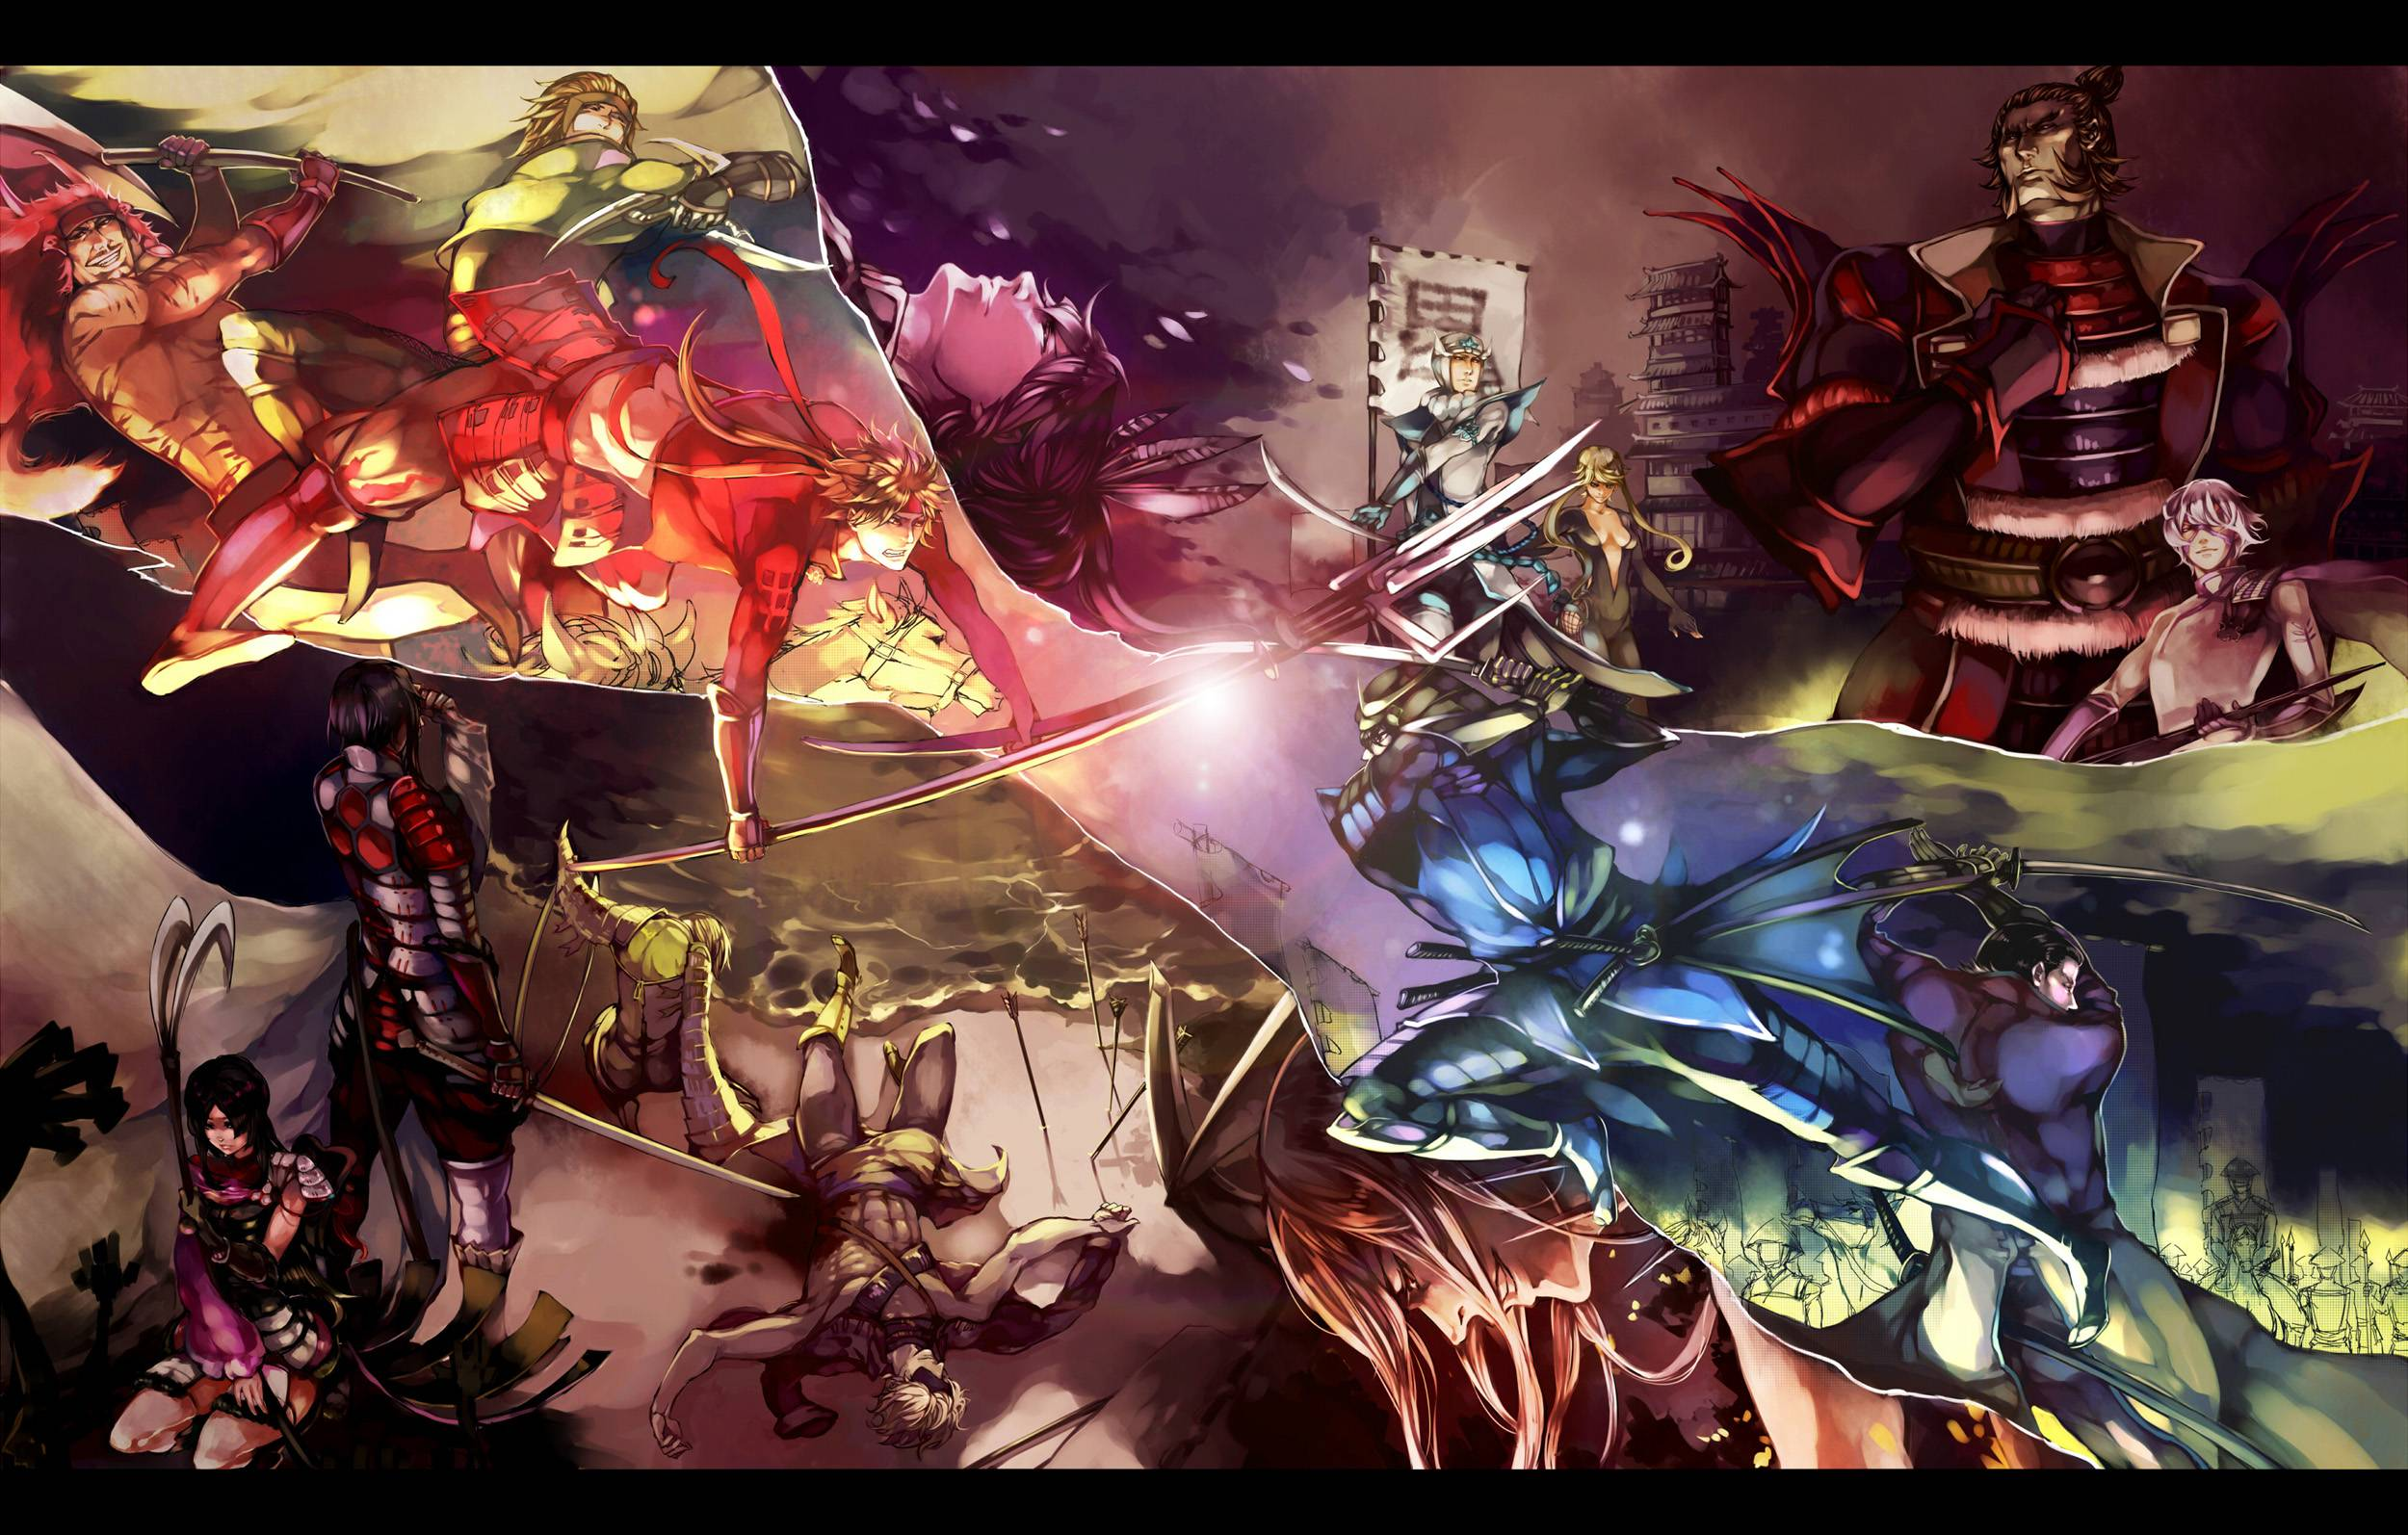 BASARA Battle Party 1452019 2